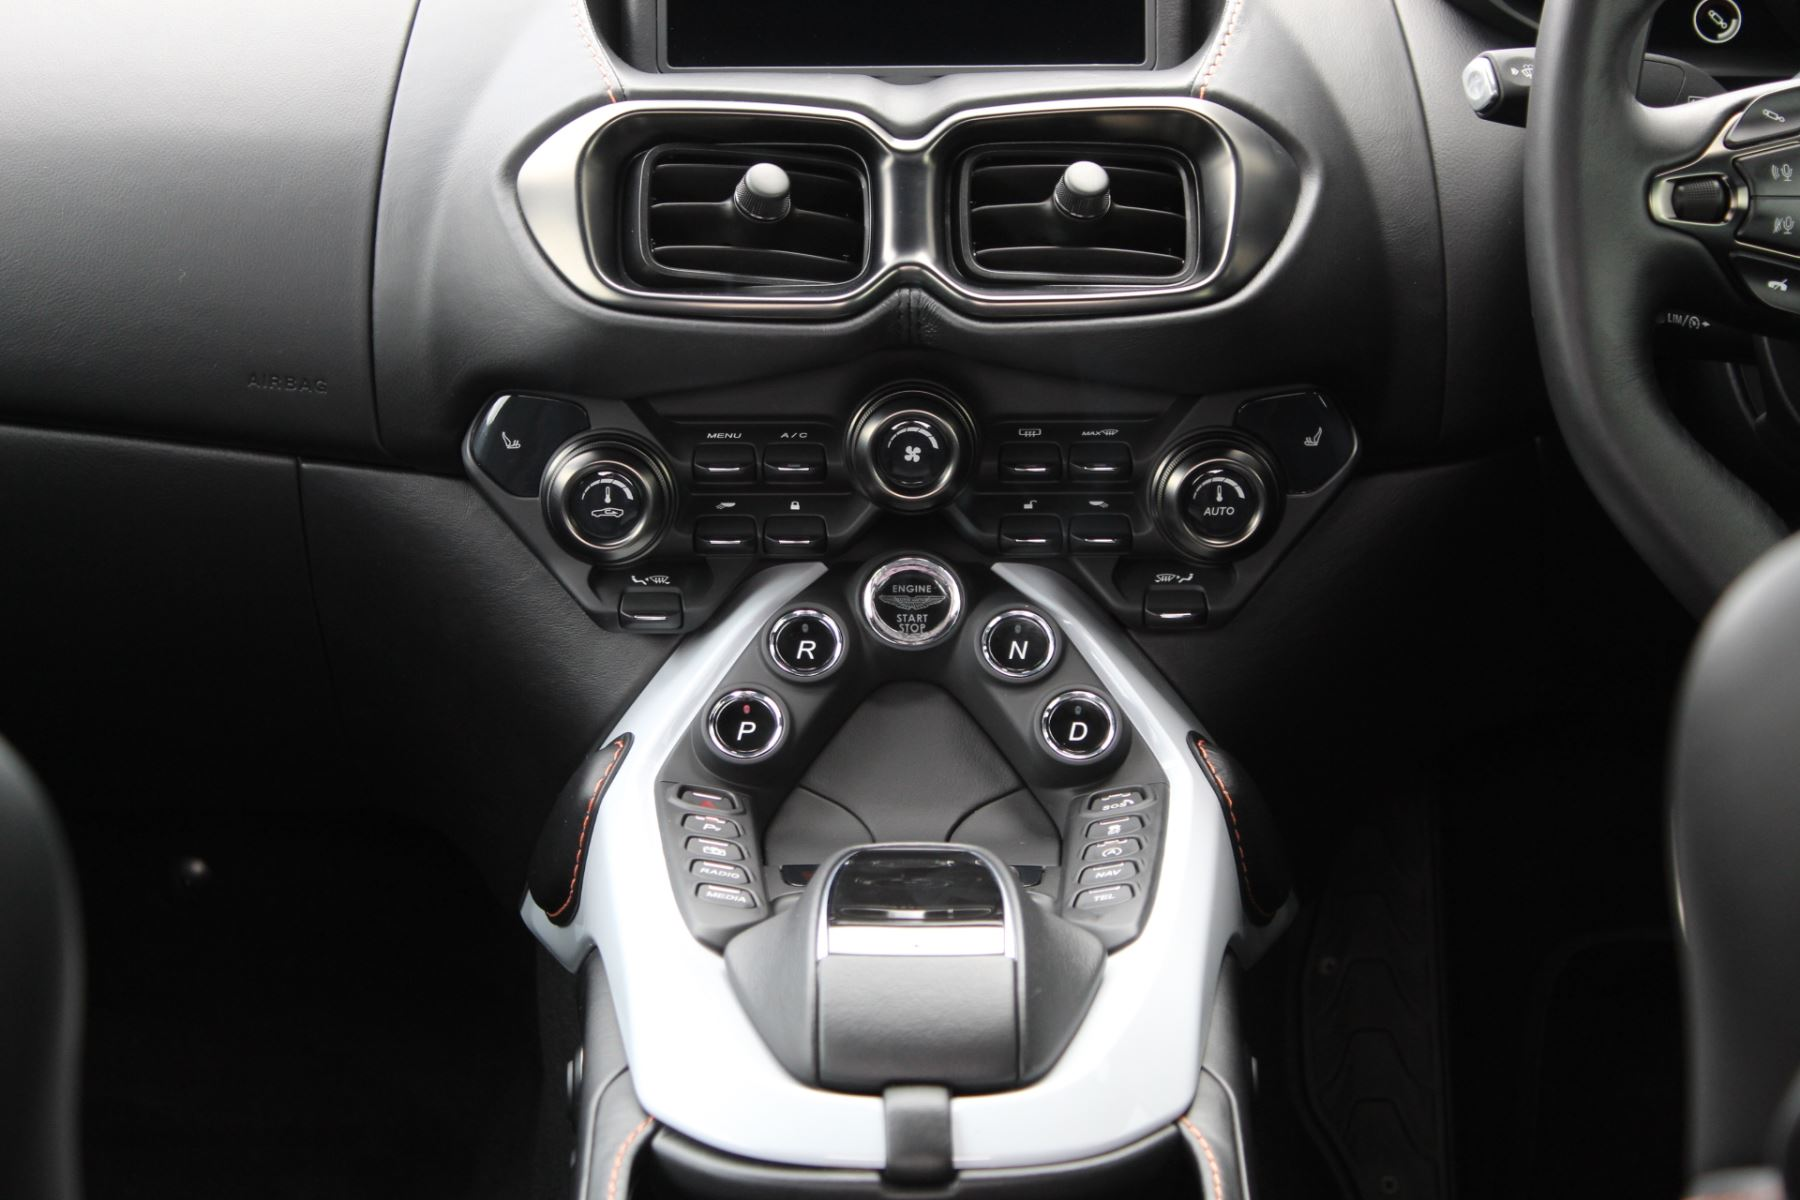 Aston Martin New Vantage 2dr ZF 8 Speed image 12